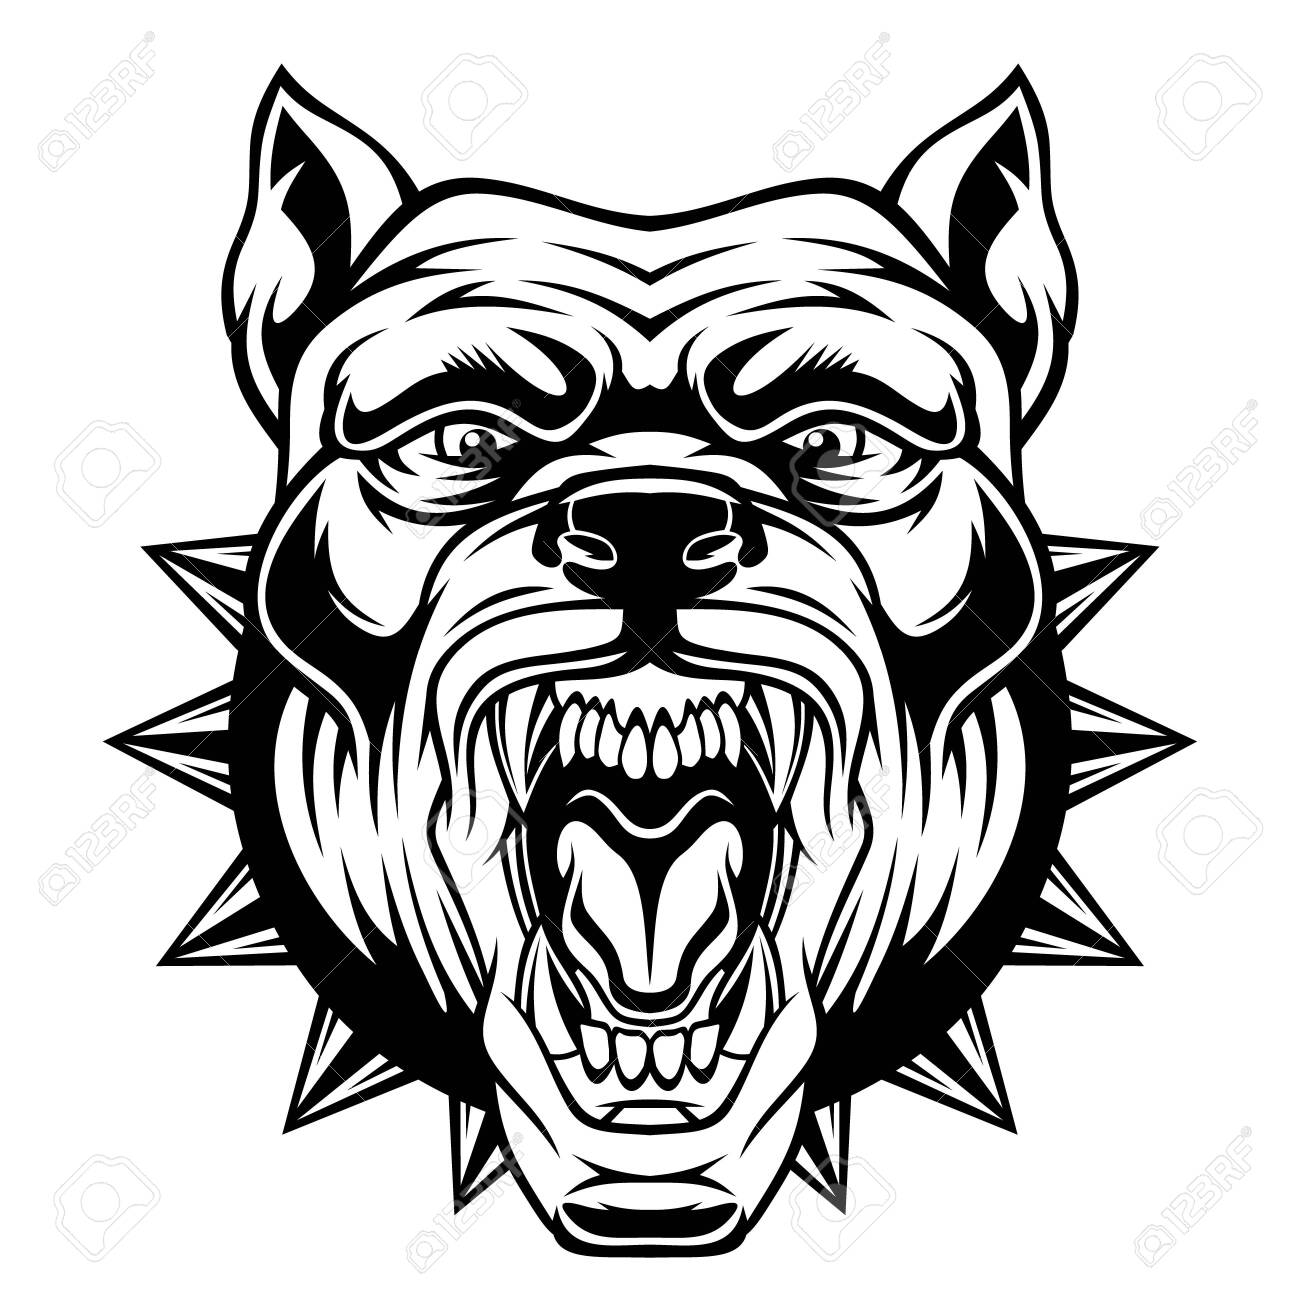 Angry pitbull head. - 129012499